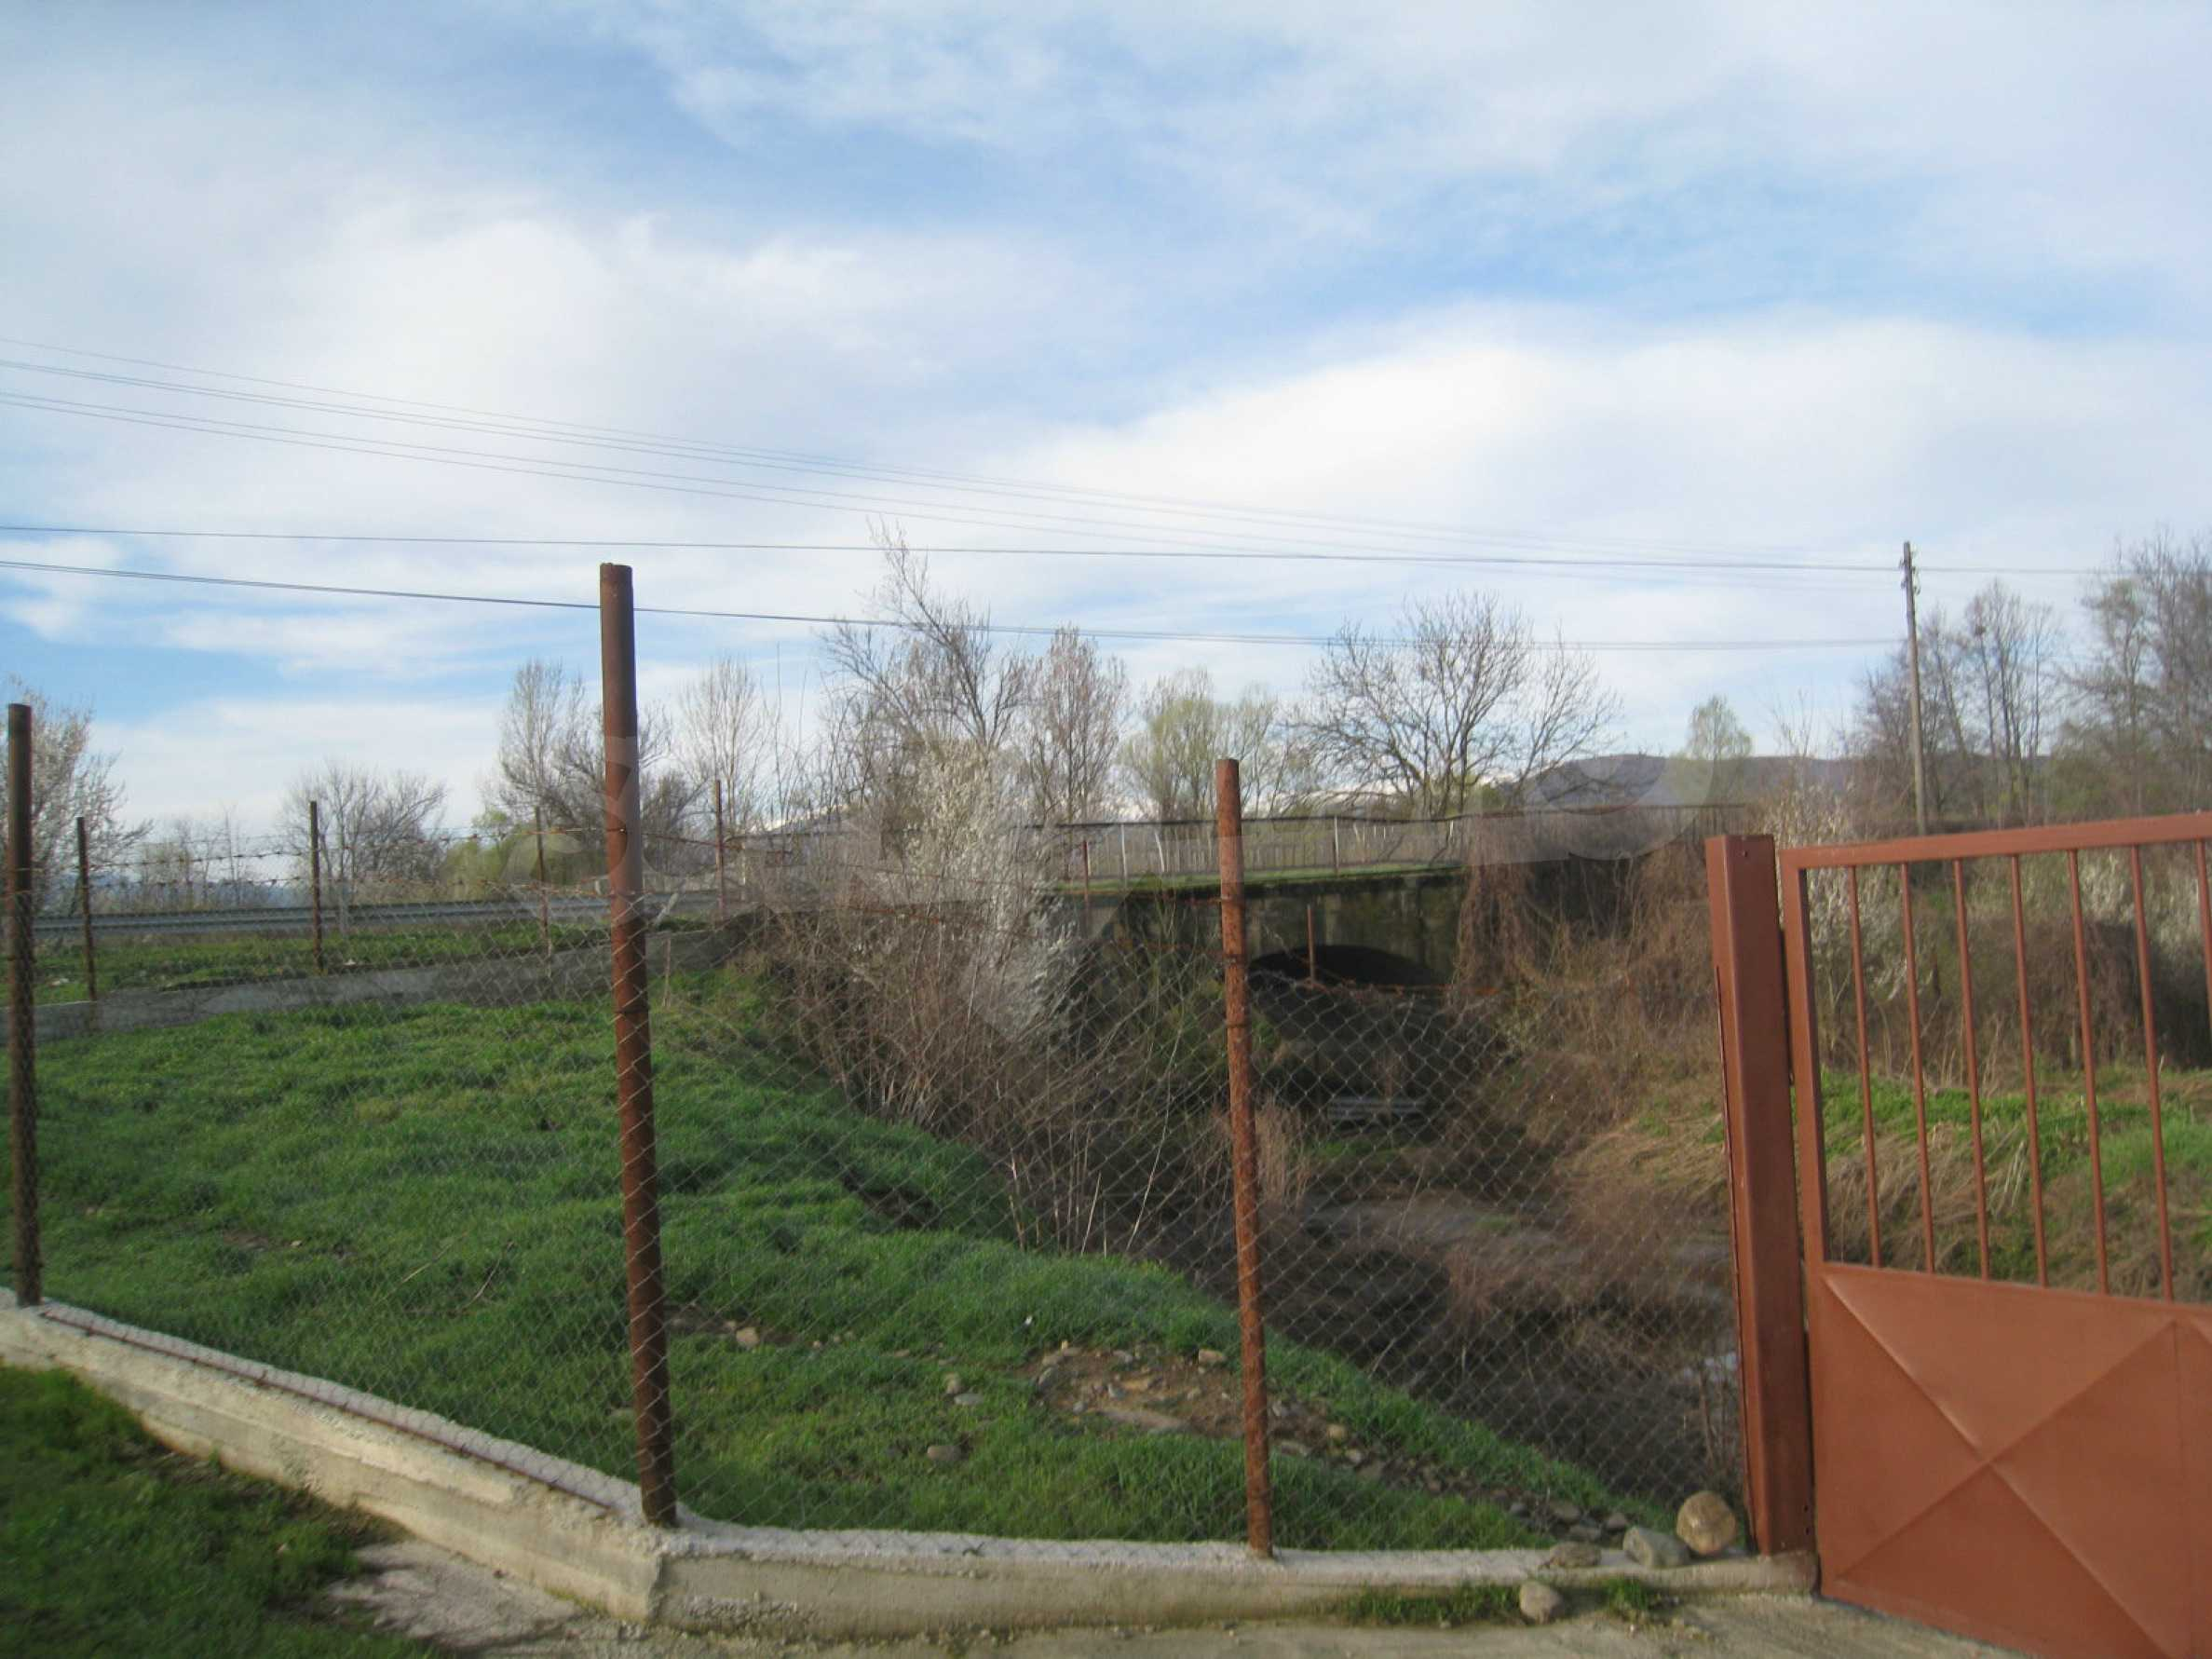 Fishpond, warehouses, residential areas and asphalt ground near Montana 42